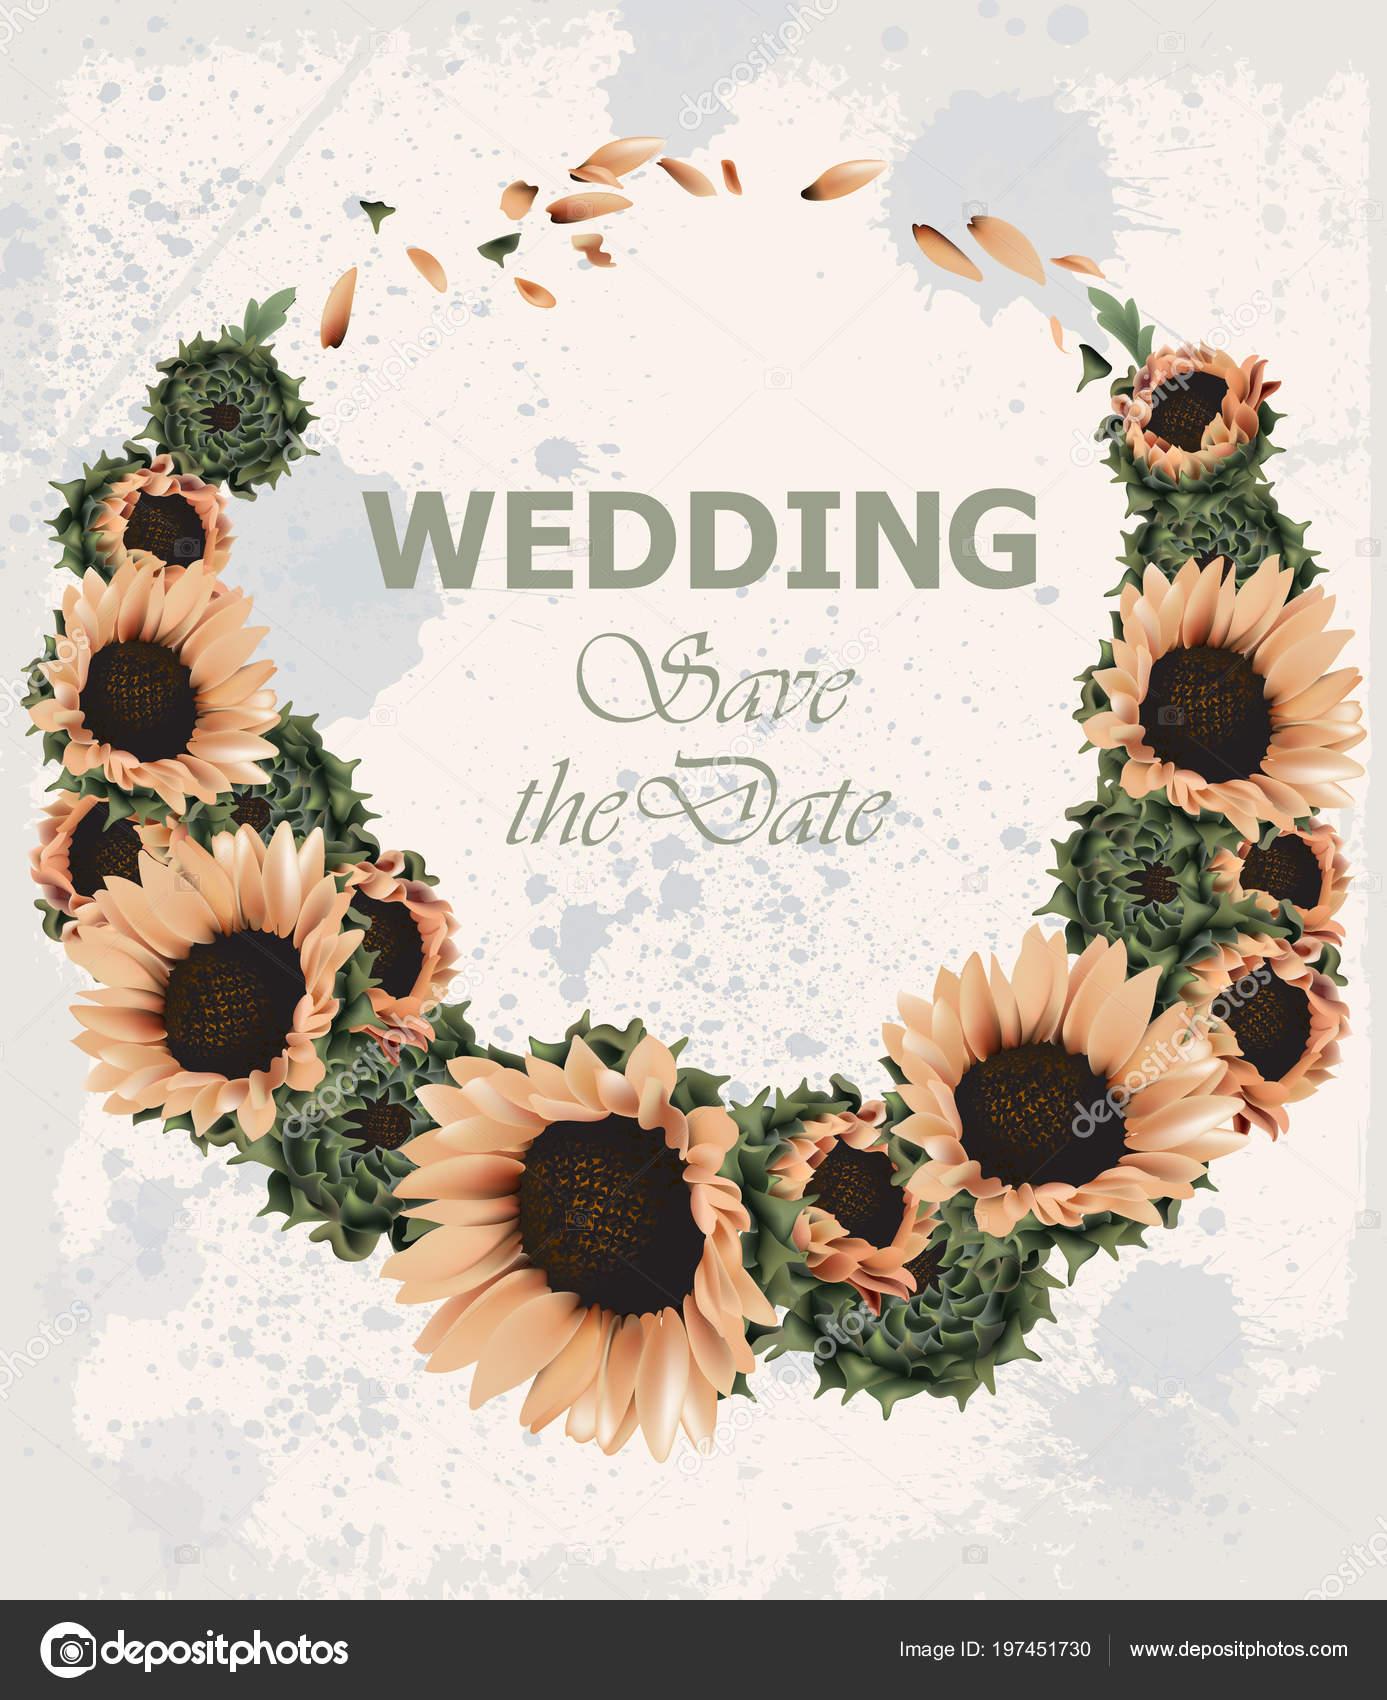 Vintage wedding invitation with sunflowers wreath vector beautiful vintage wedding invitation with sunflowers wreath vector beautiful spring summer card old grunge style stopboris Choice Image